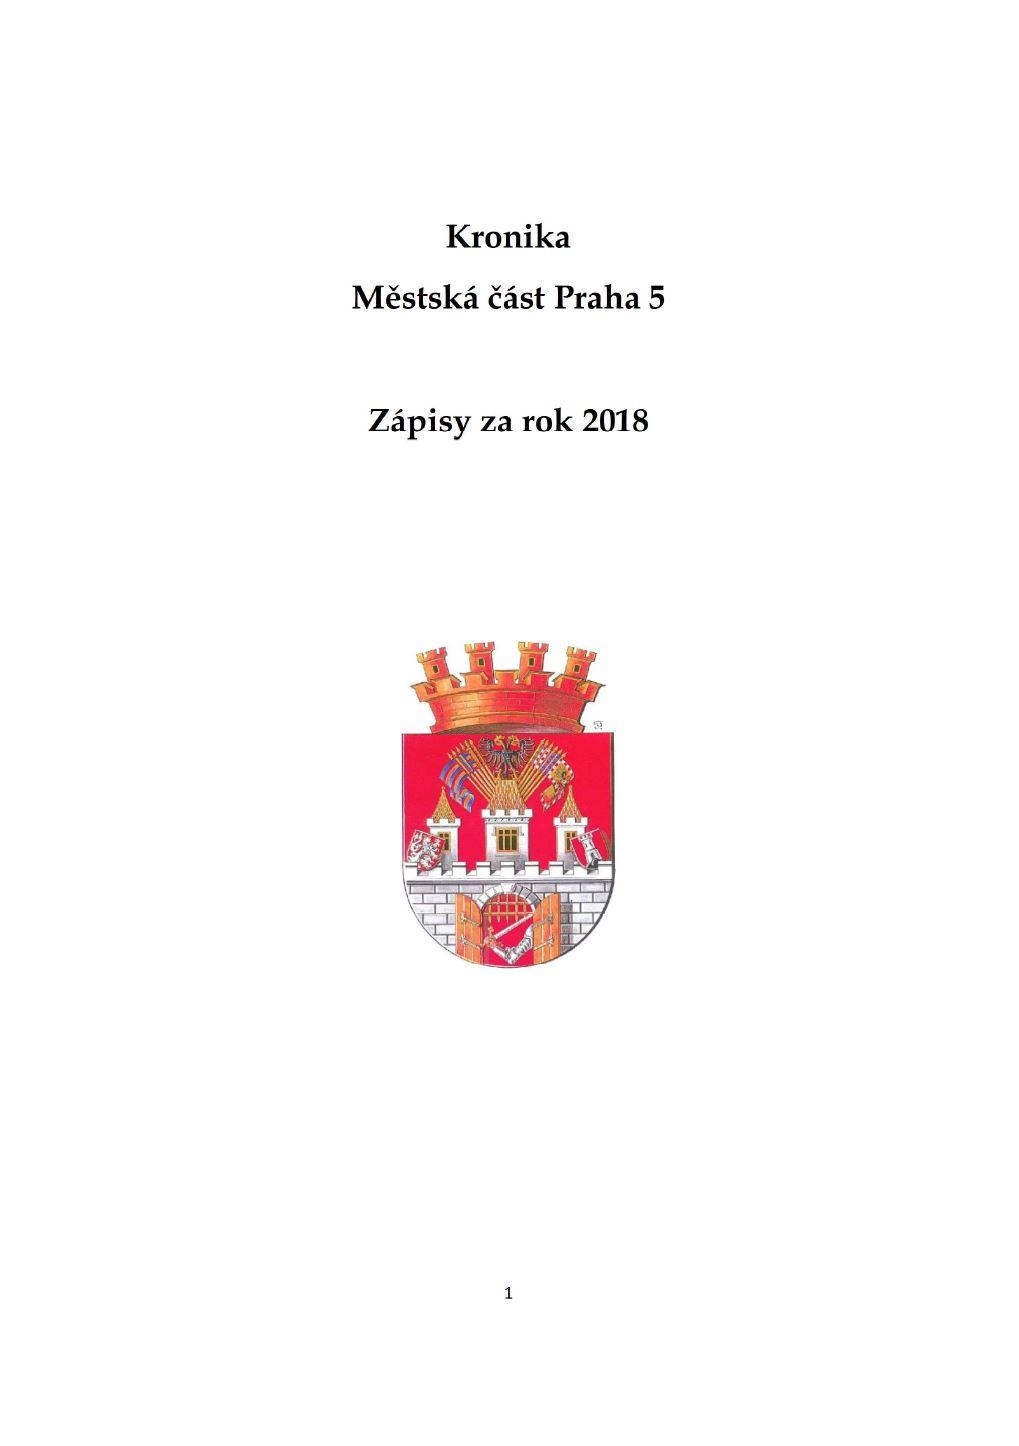 Kronika MČ Praha 5